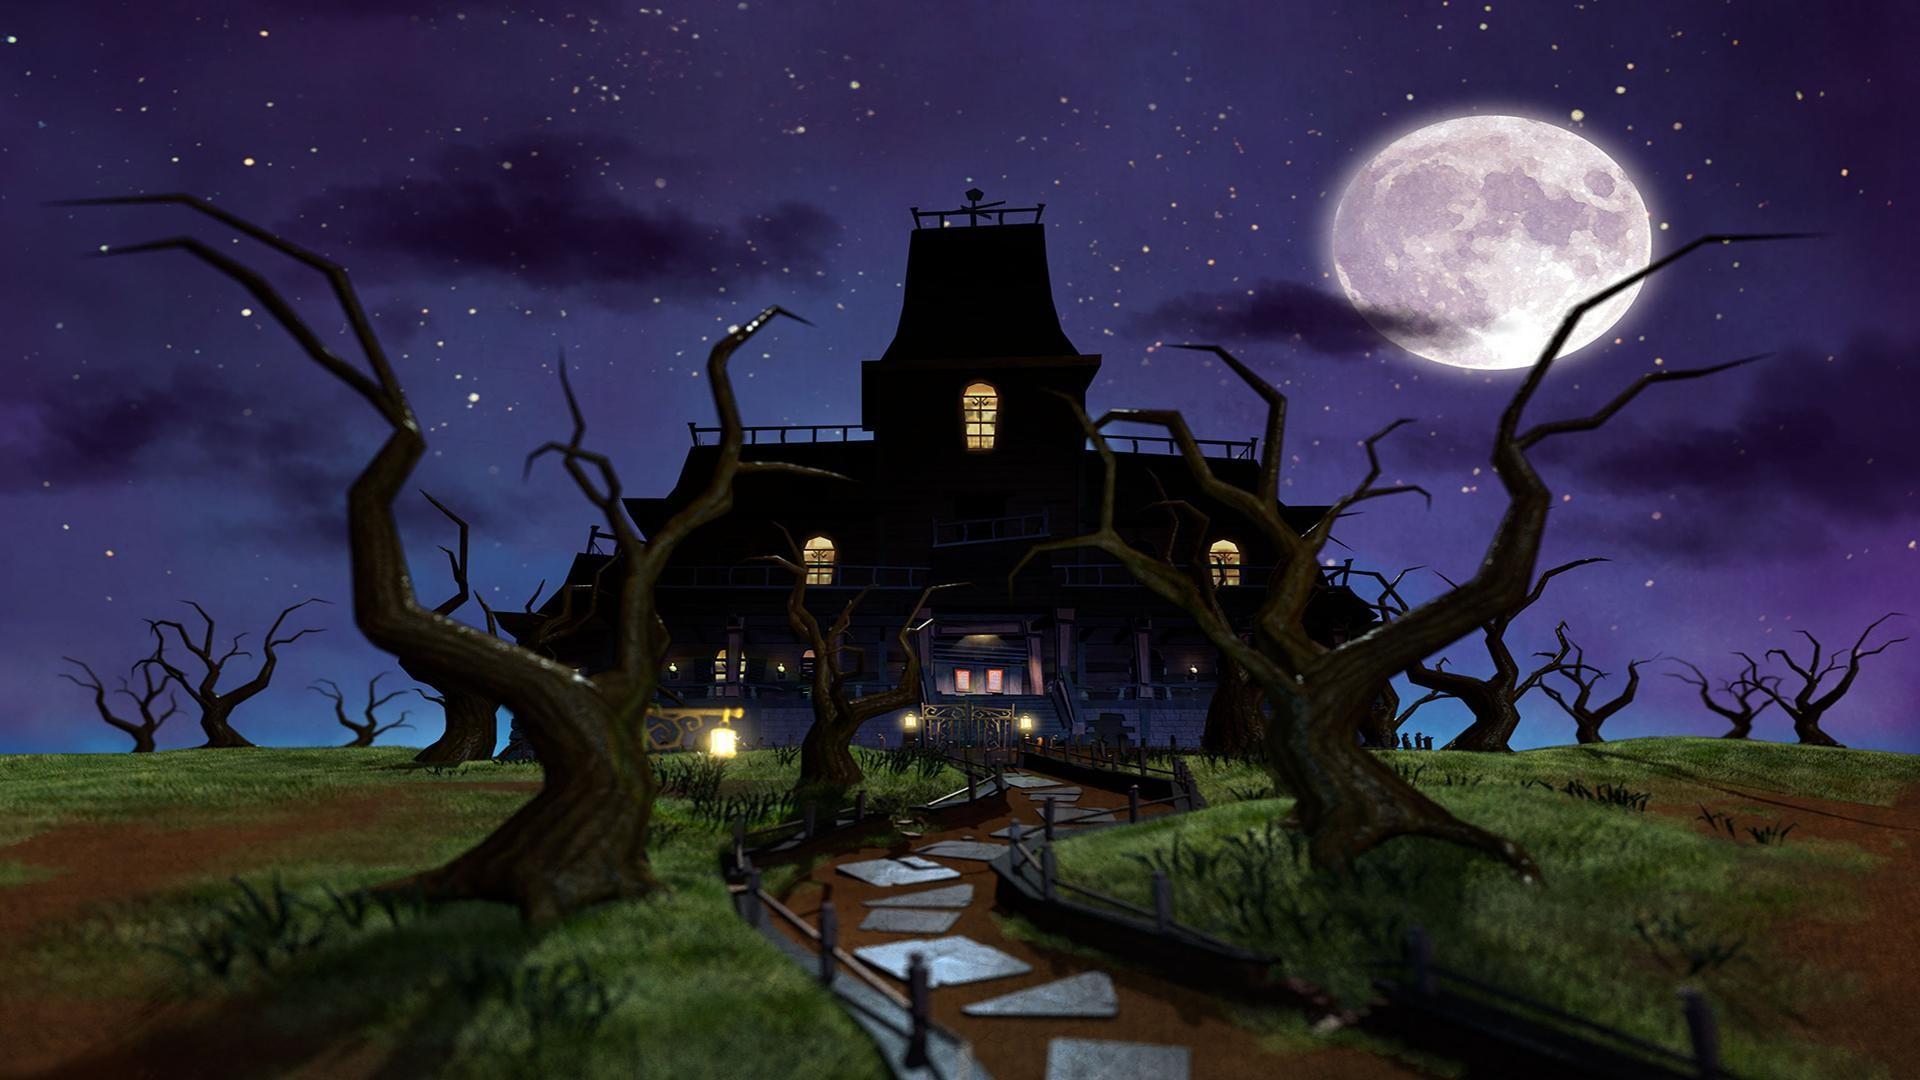 haunted mansion wallpaper 183�� download free stunning full